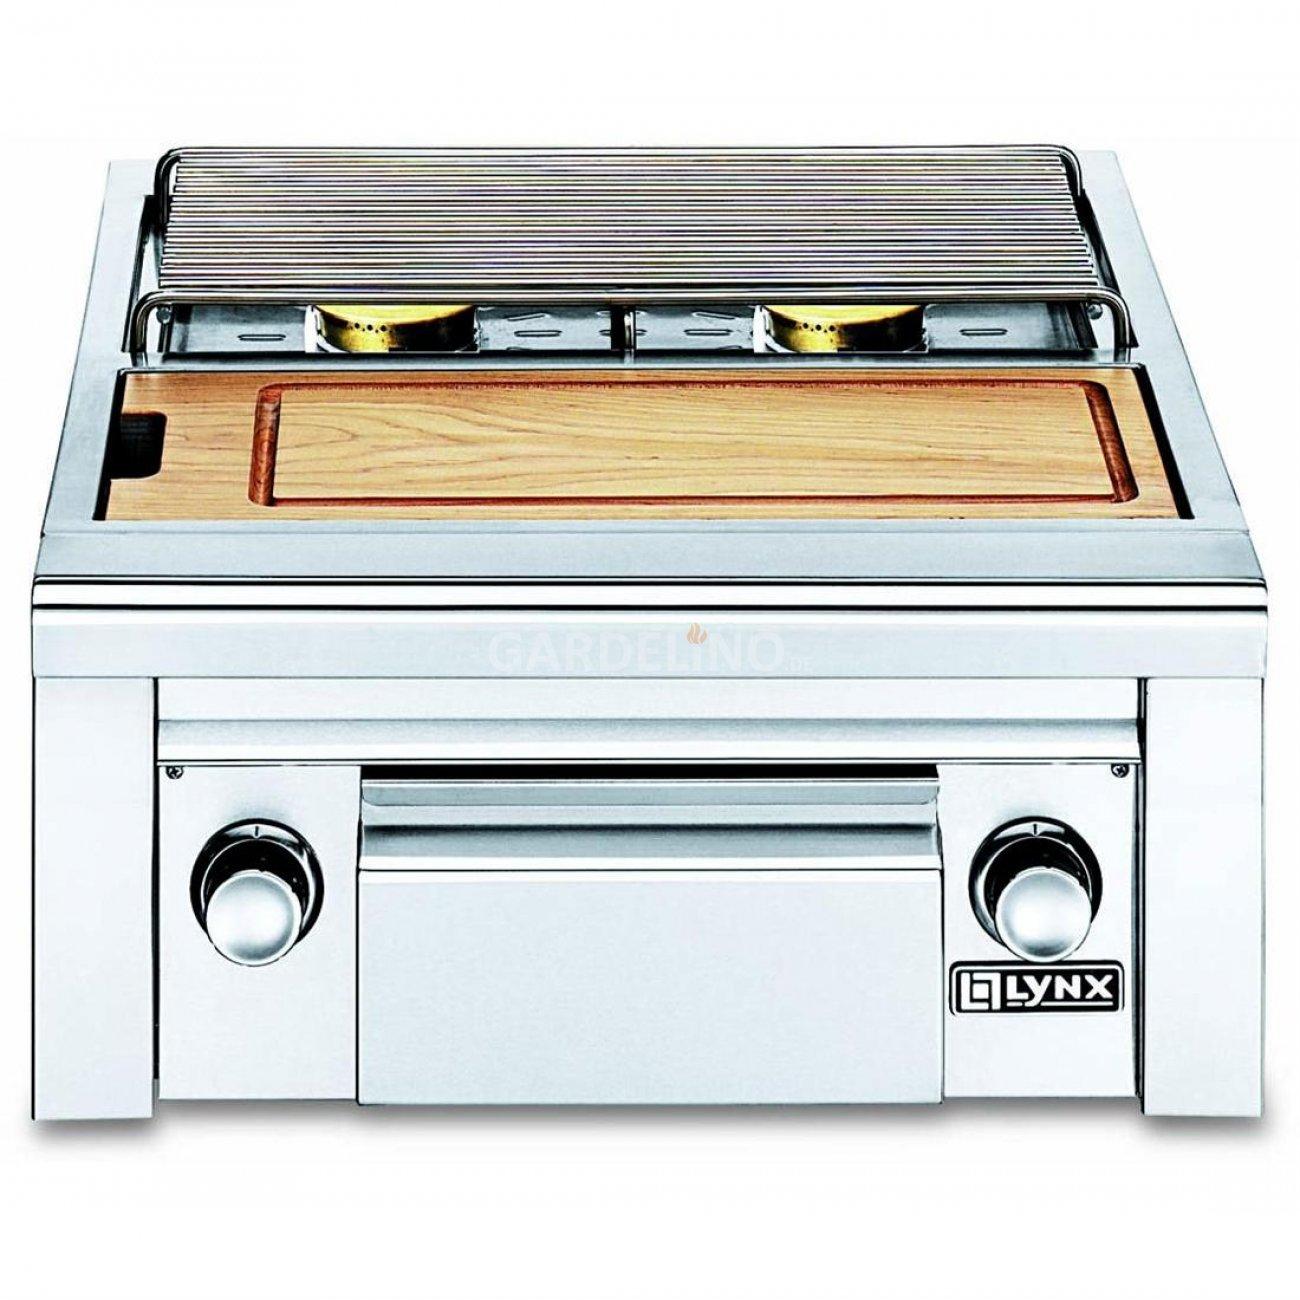 lynx grill premium seitenbrenner f r die au enk che. Black Bedroom Furniture Sets. Home Design Ideas